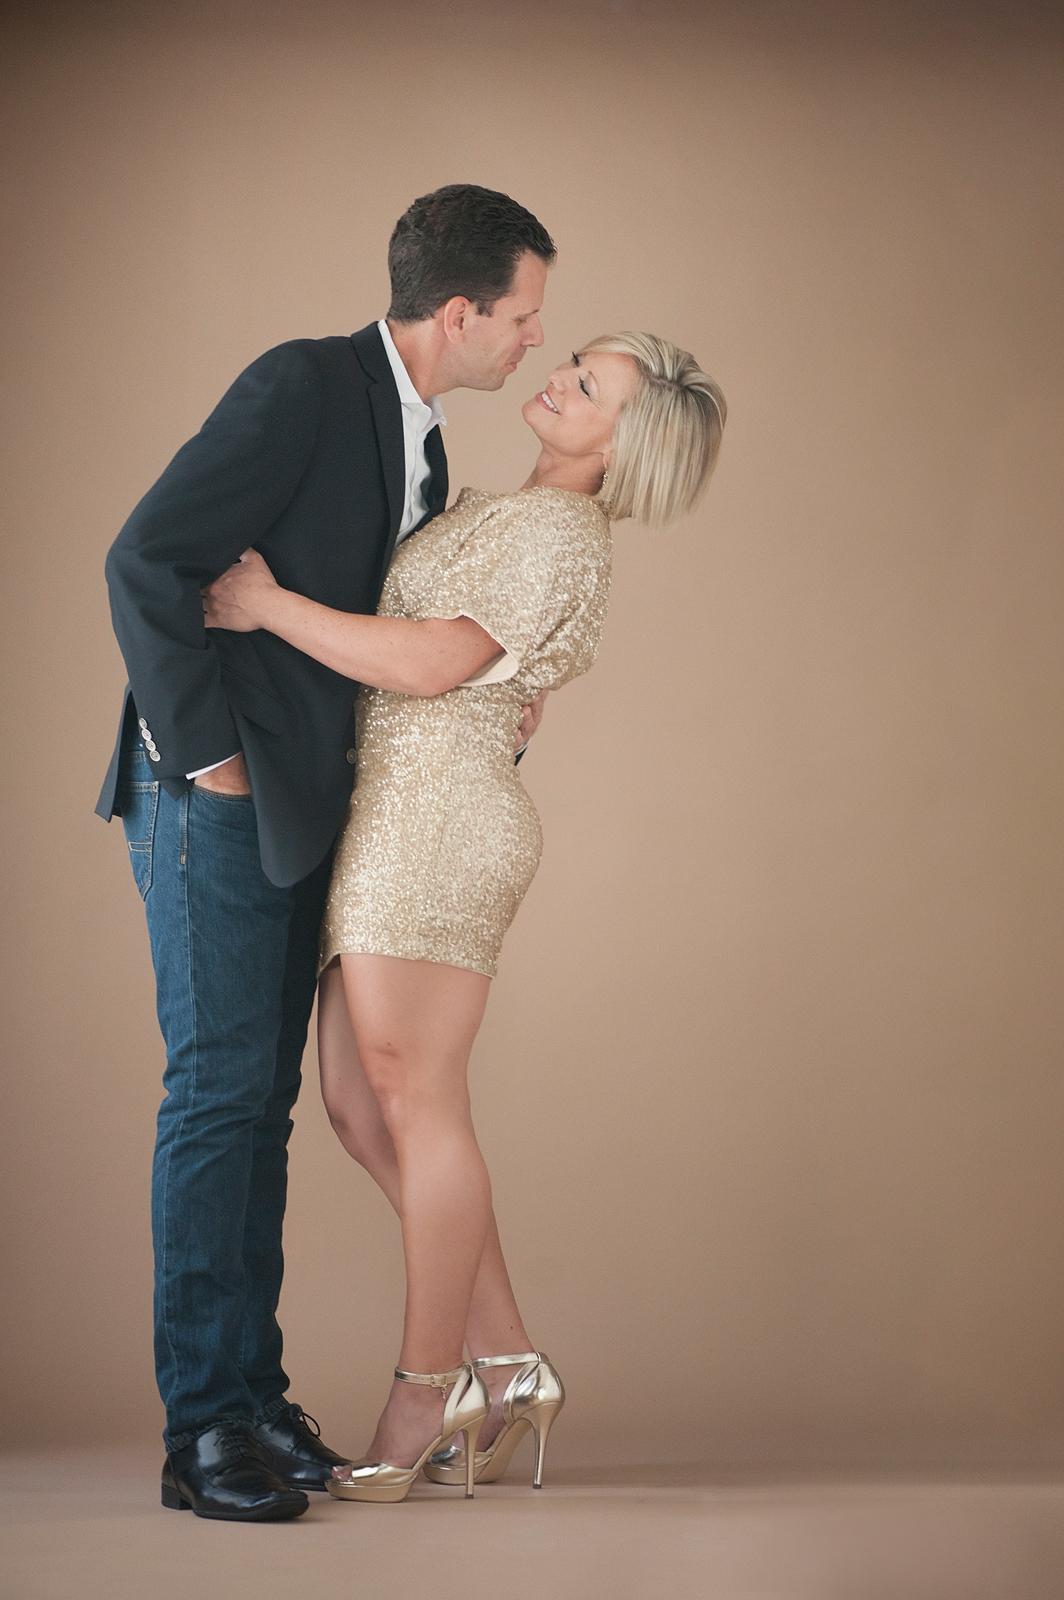 14-kissing-man-woman-leaning-fun.jpg